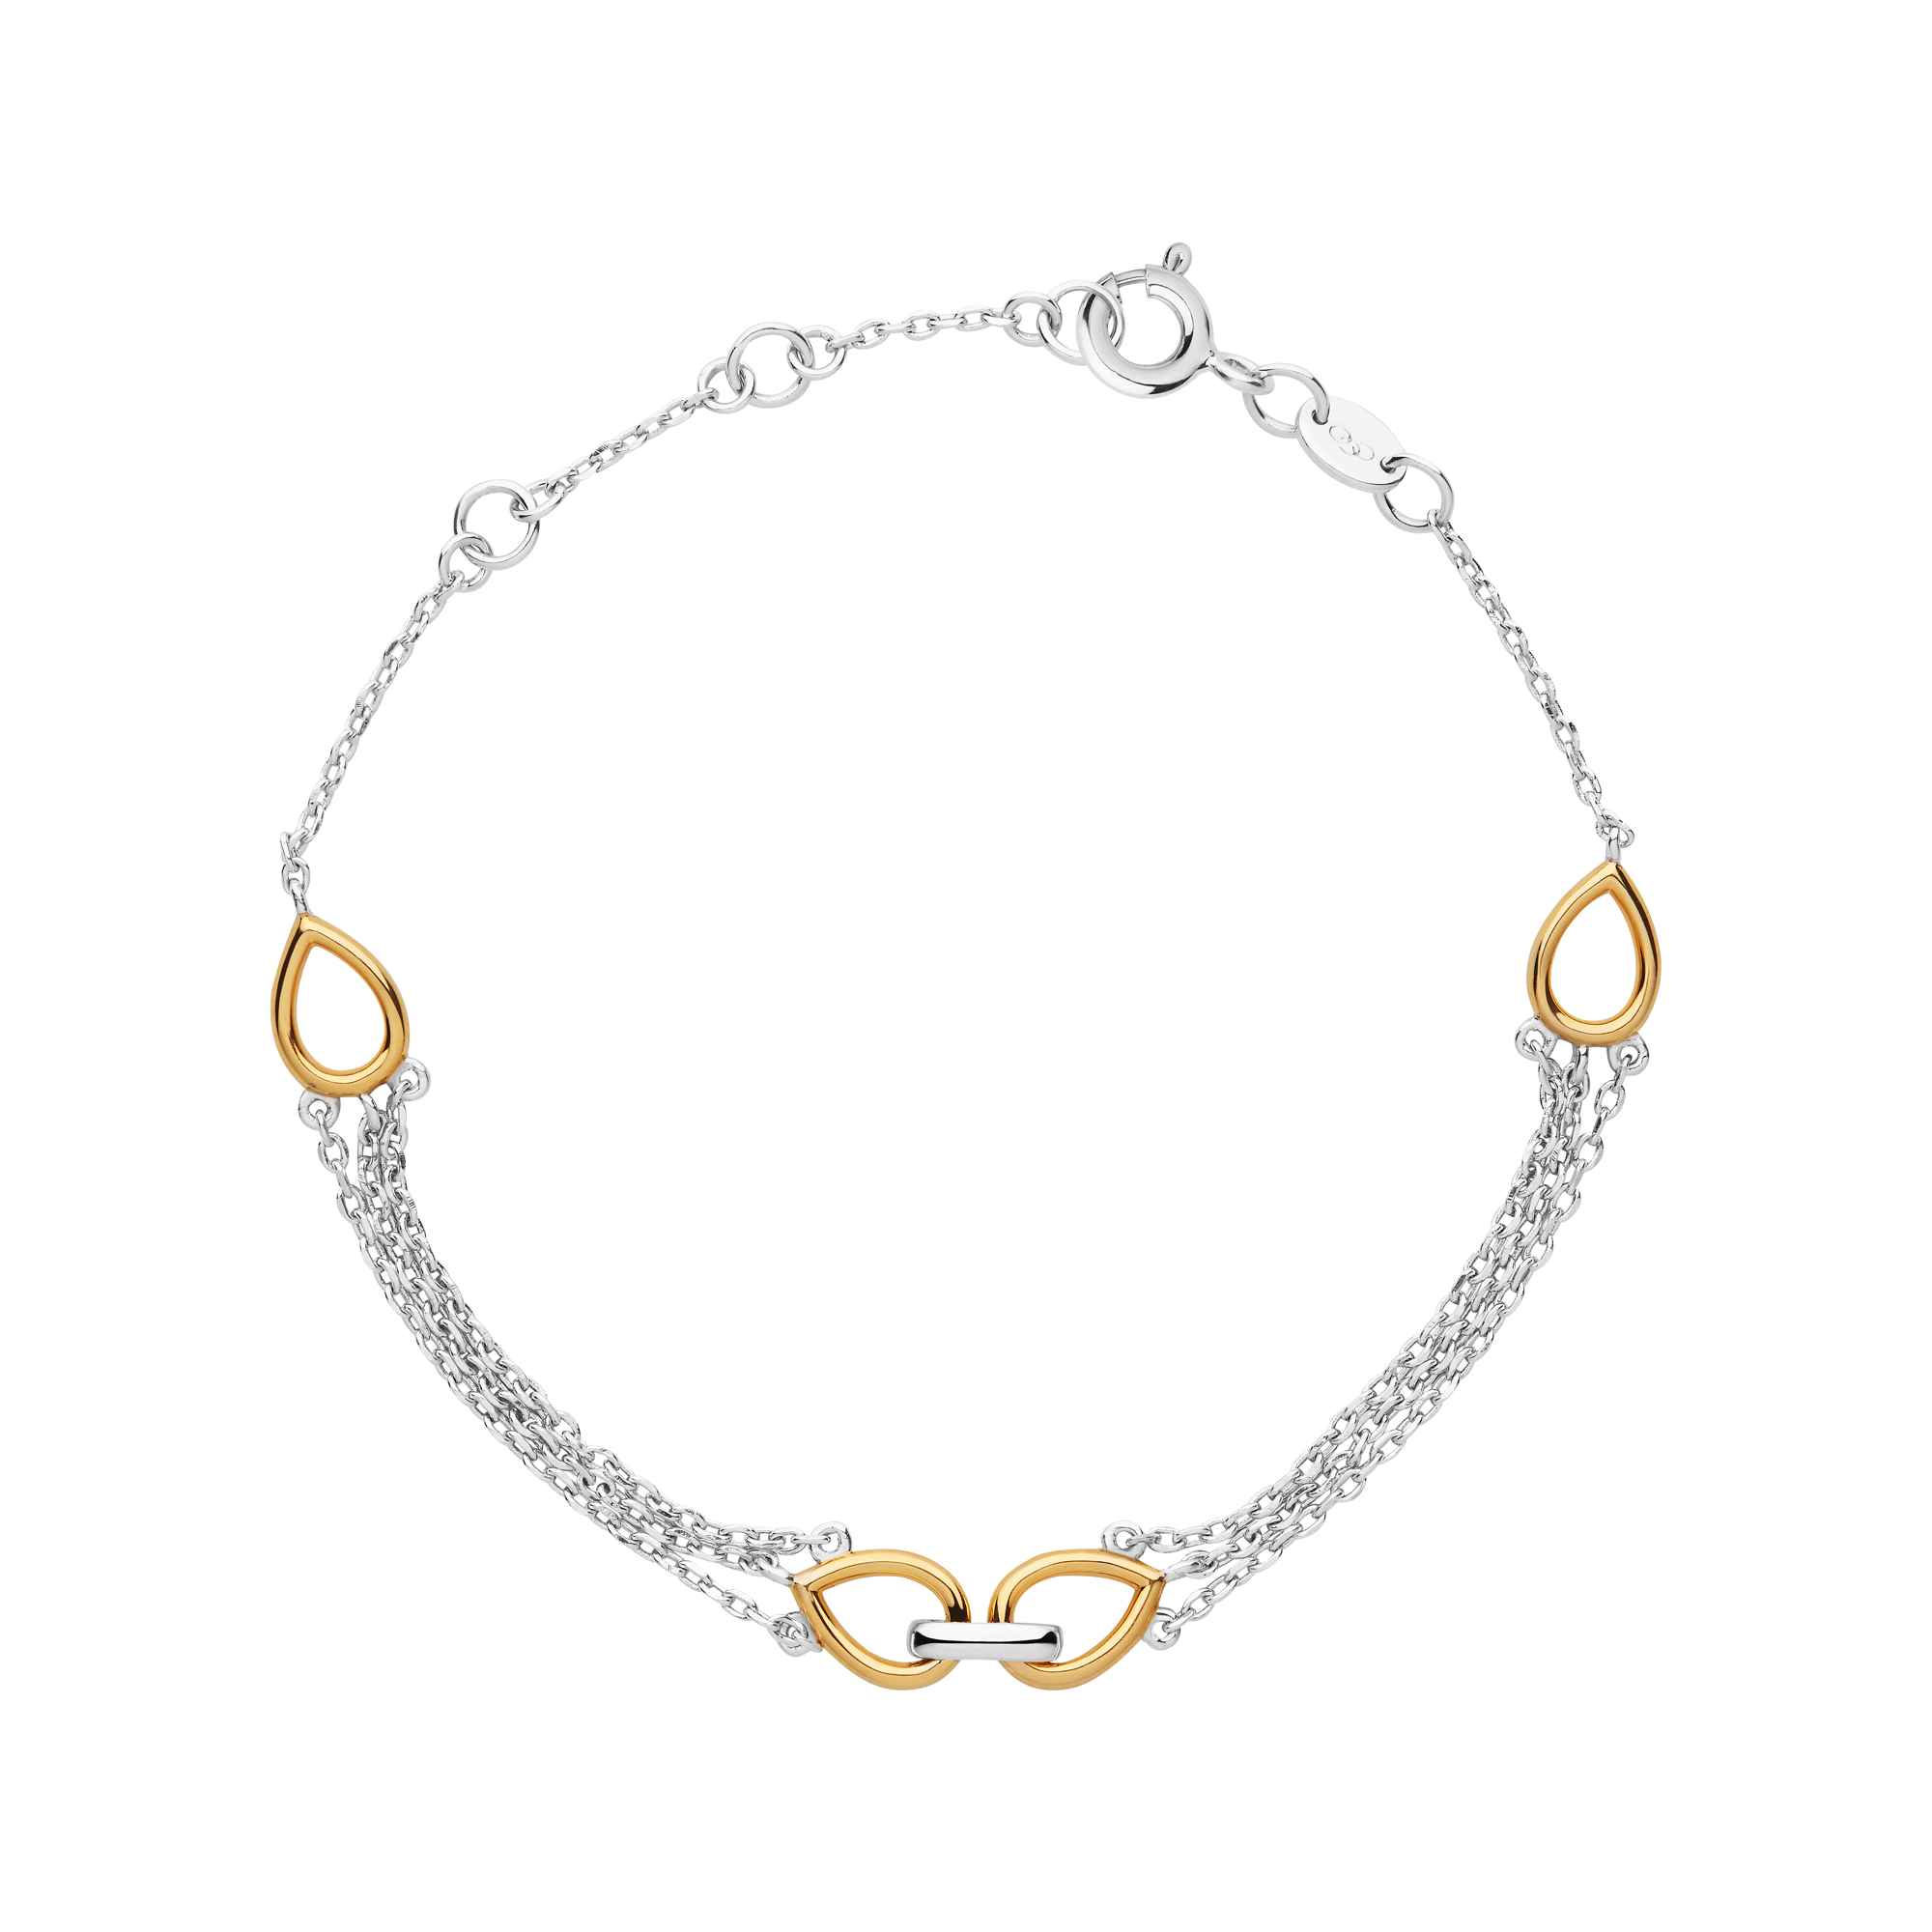 LINKS OF LONDON - Ασημένιο βραχιόλι Flare Double γυναικεία αξεσουάρ κοσμήματα βραχιόλια